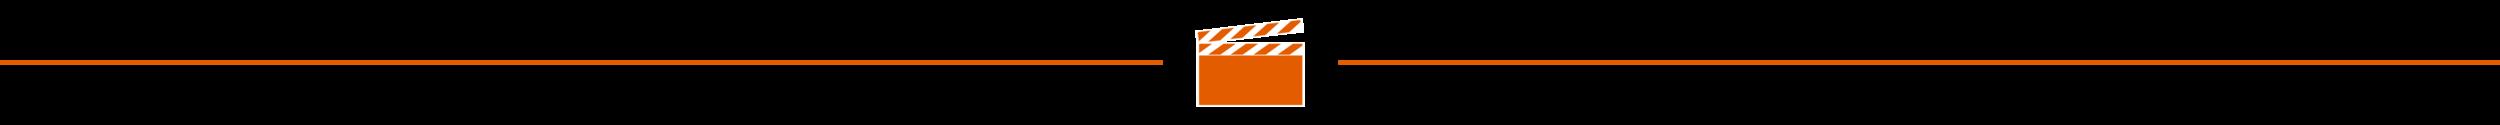 Clapper-Icon-Long-4x.png